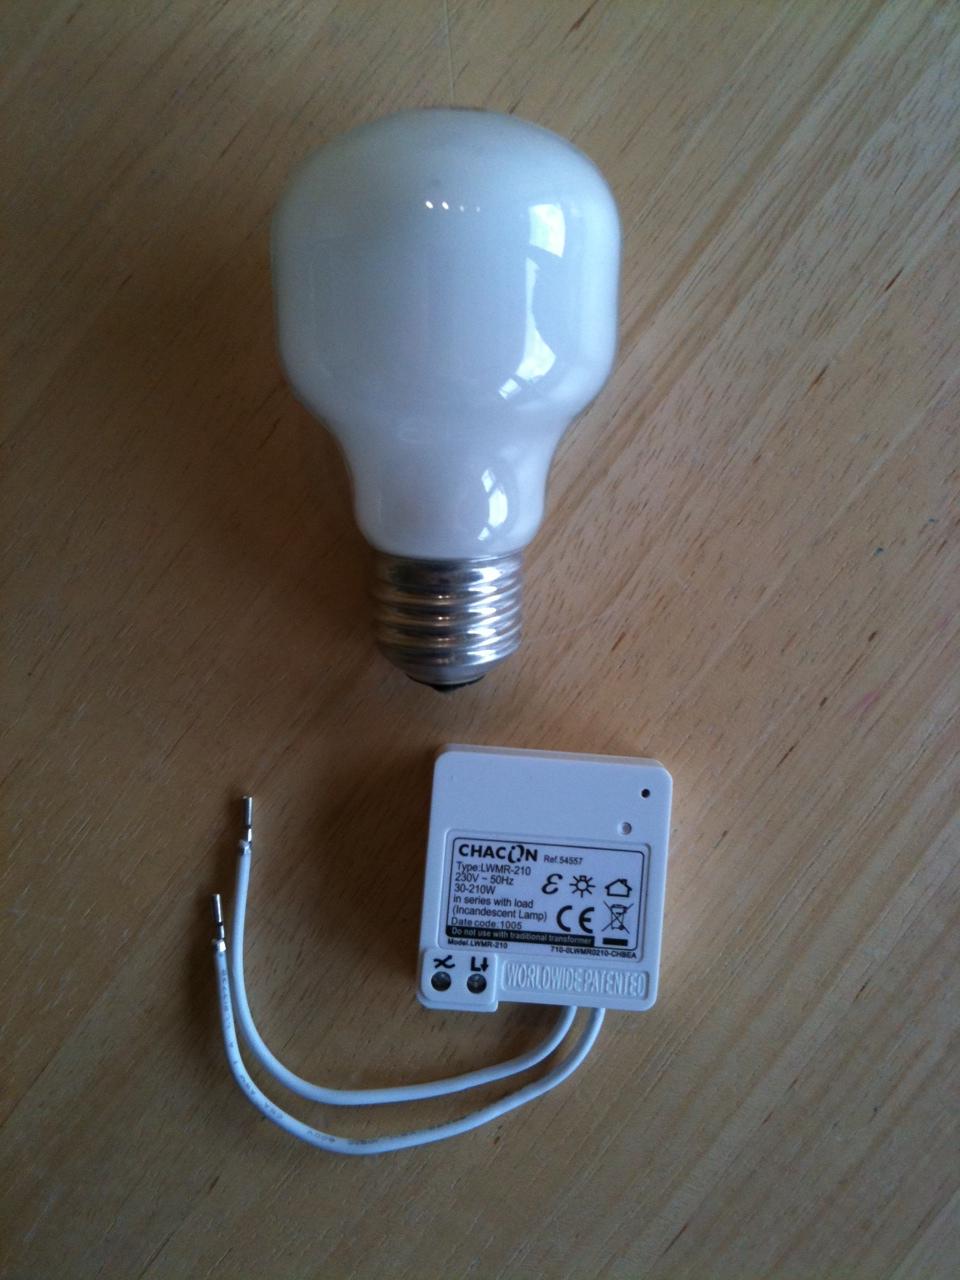 Luminaire wifi